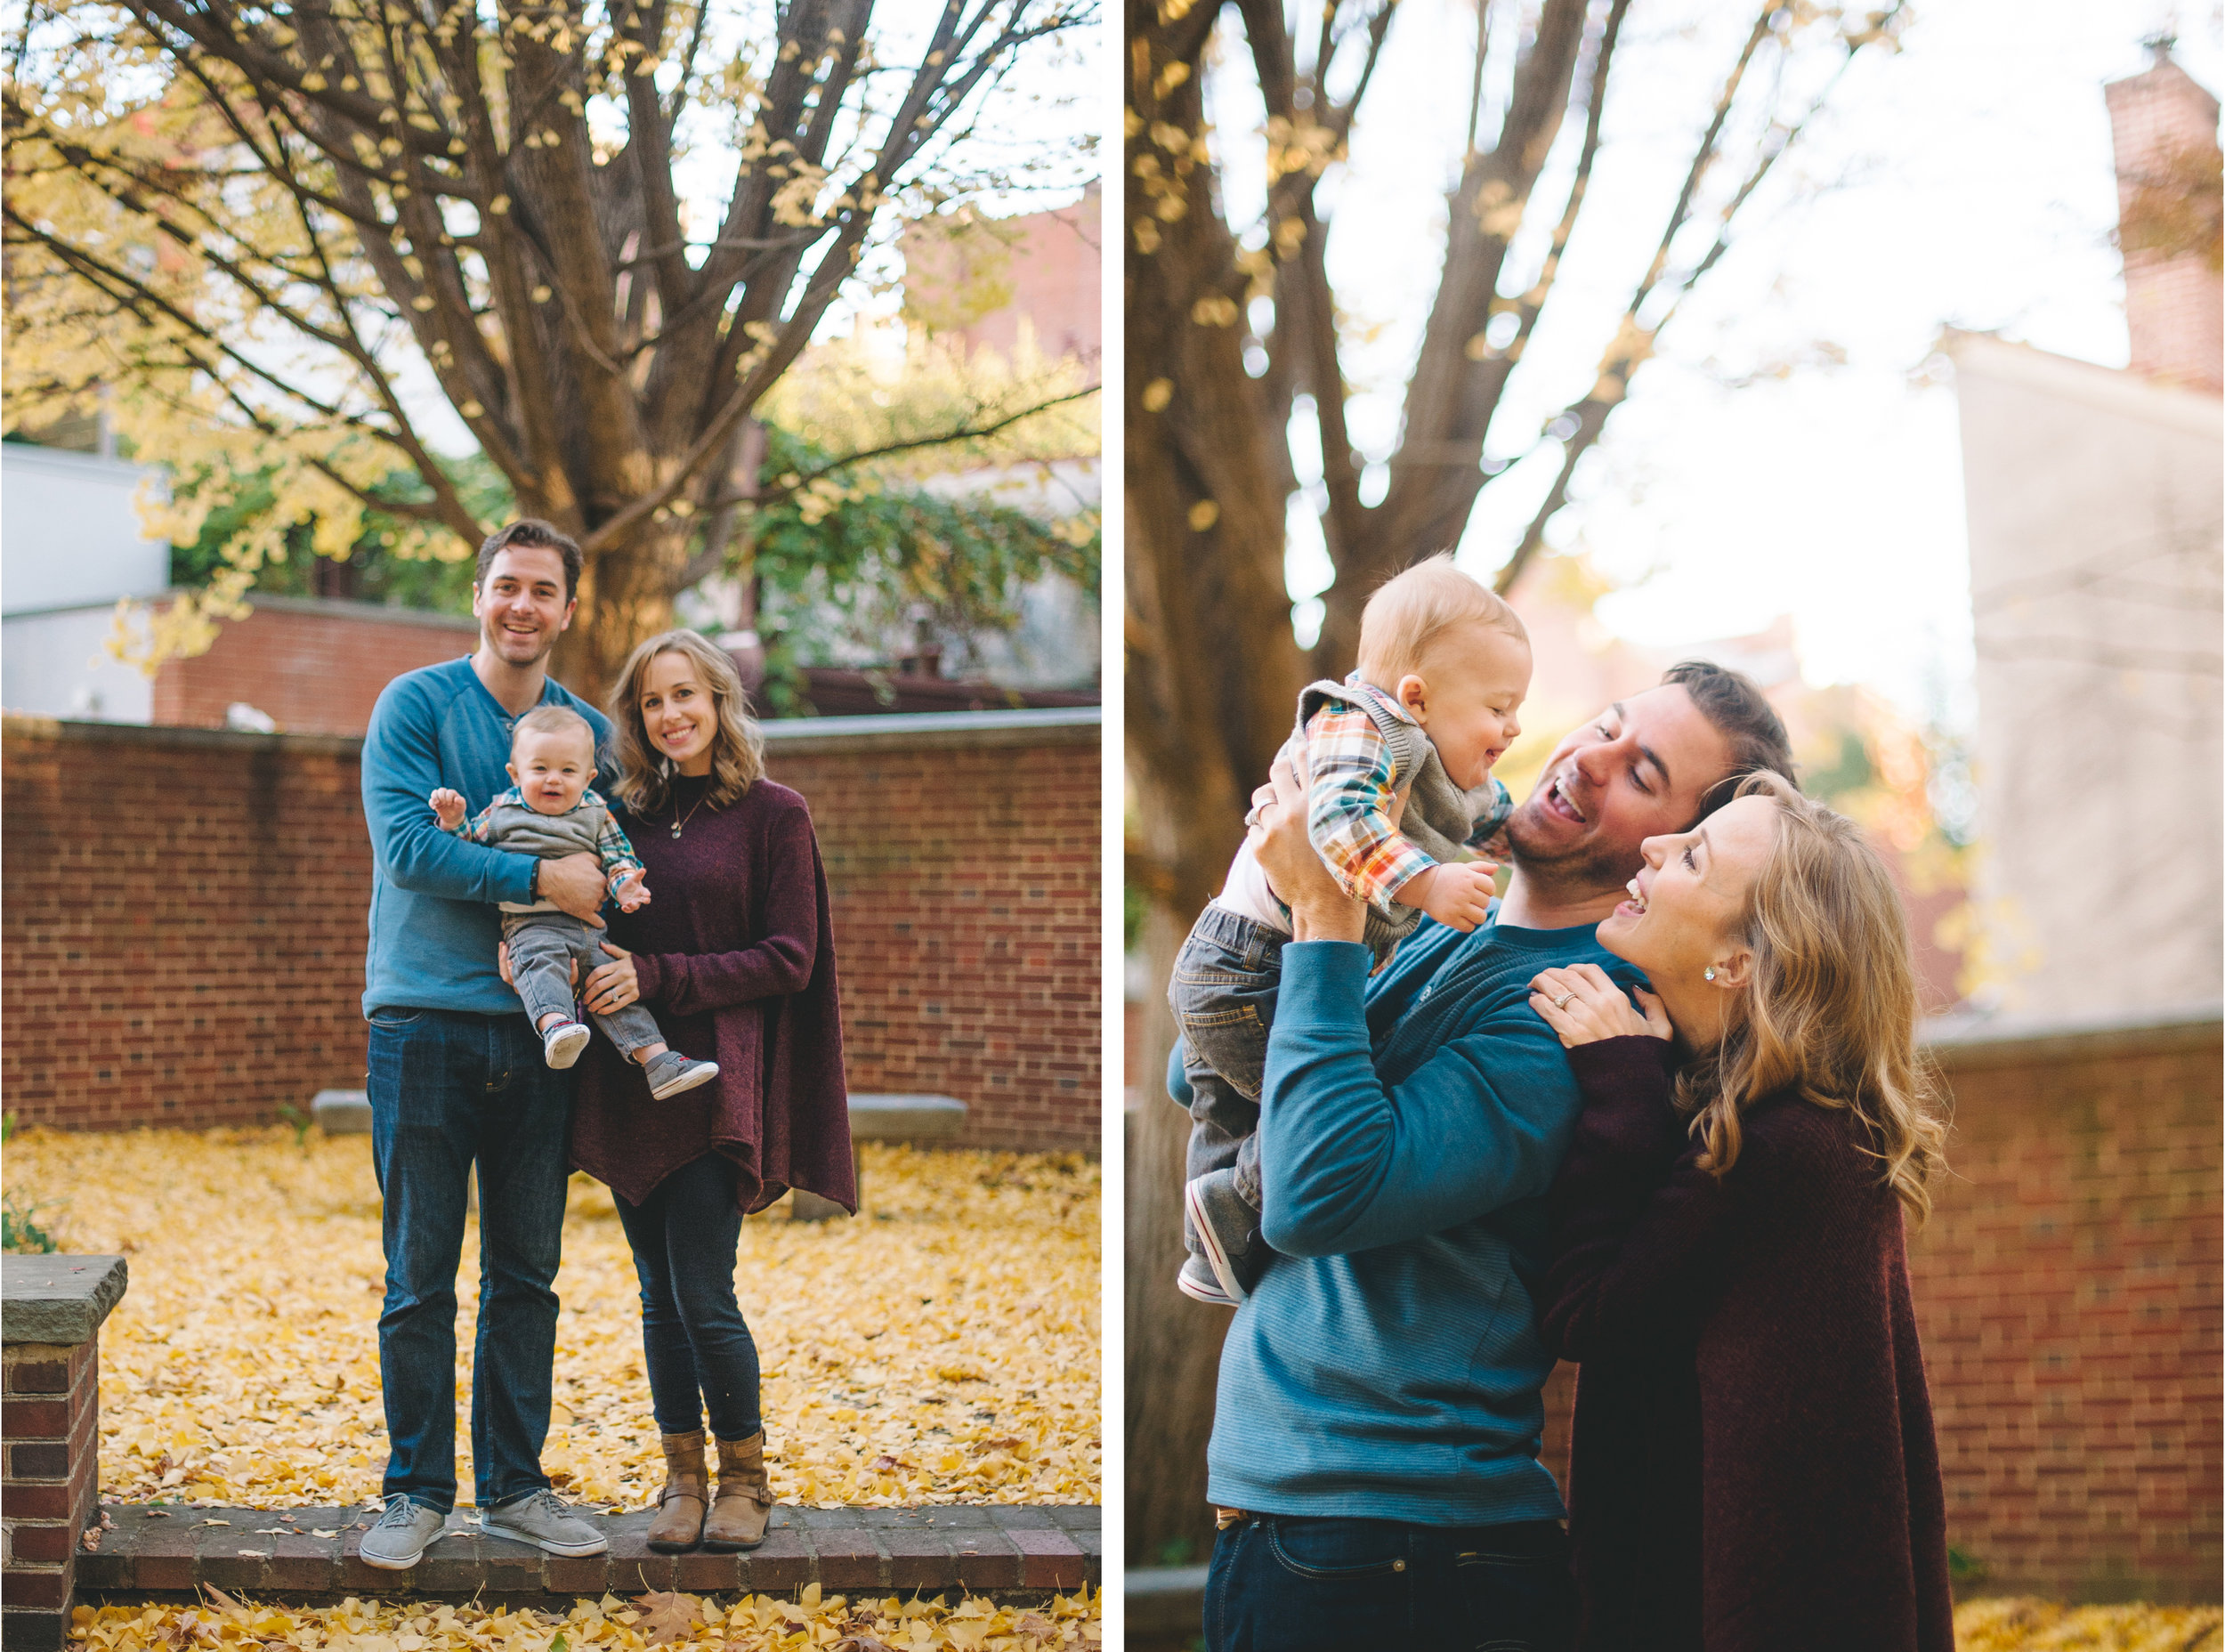 Peaberry-Photography-Philadlphia-Family-Portraits-020.jpg